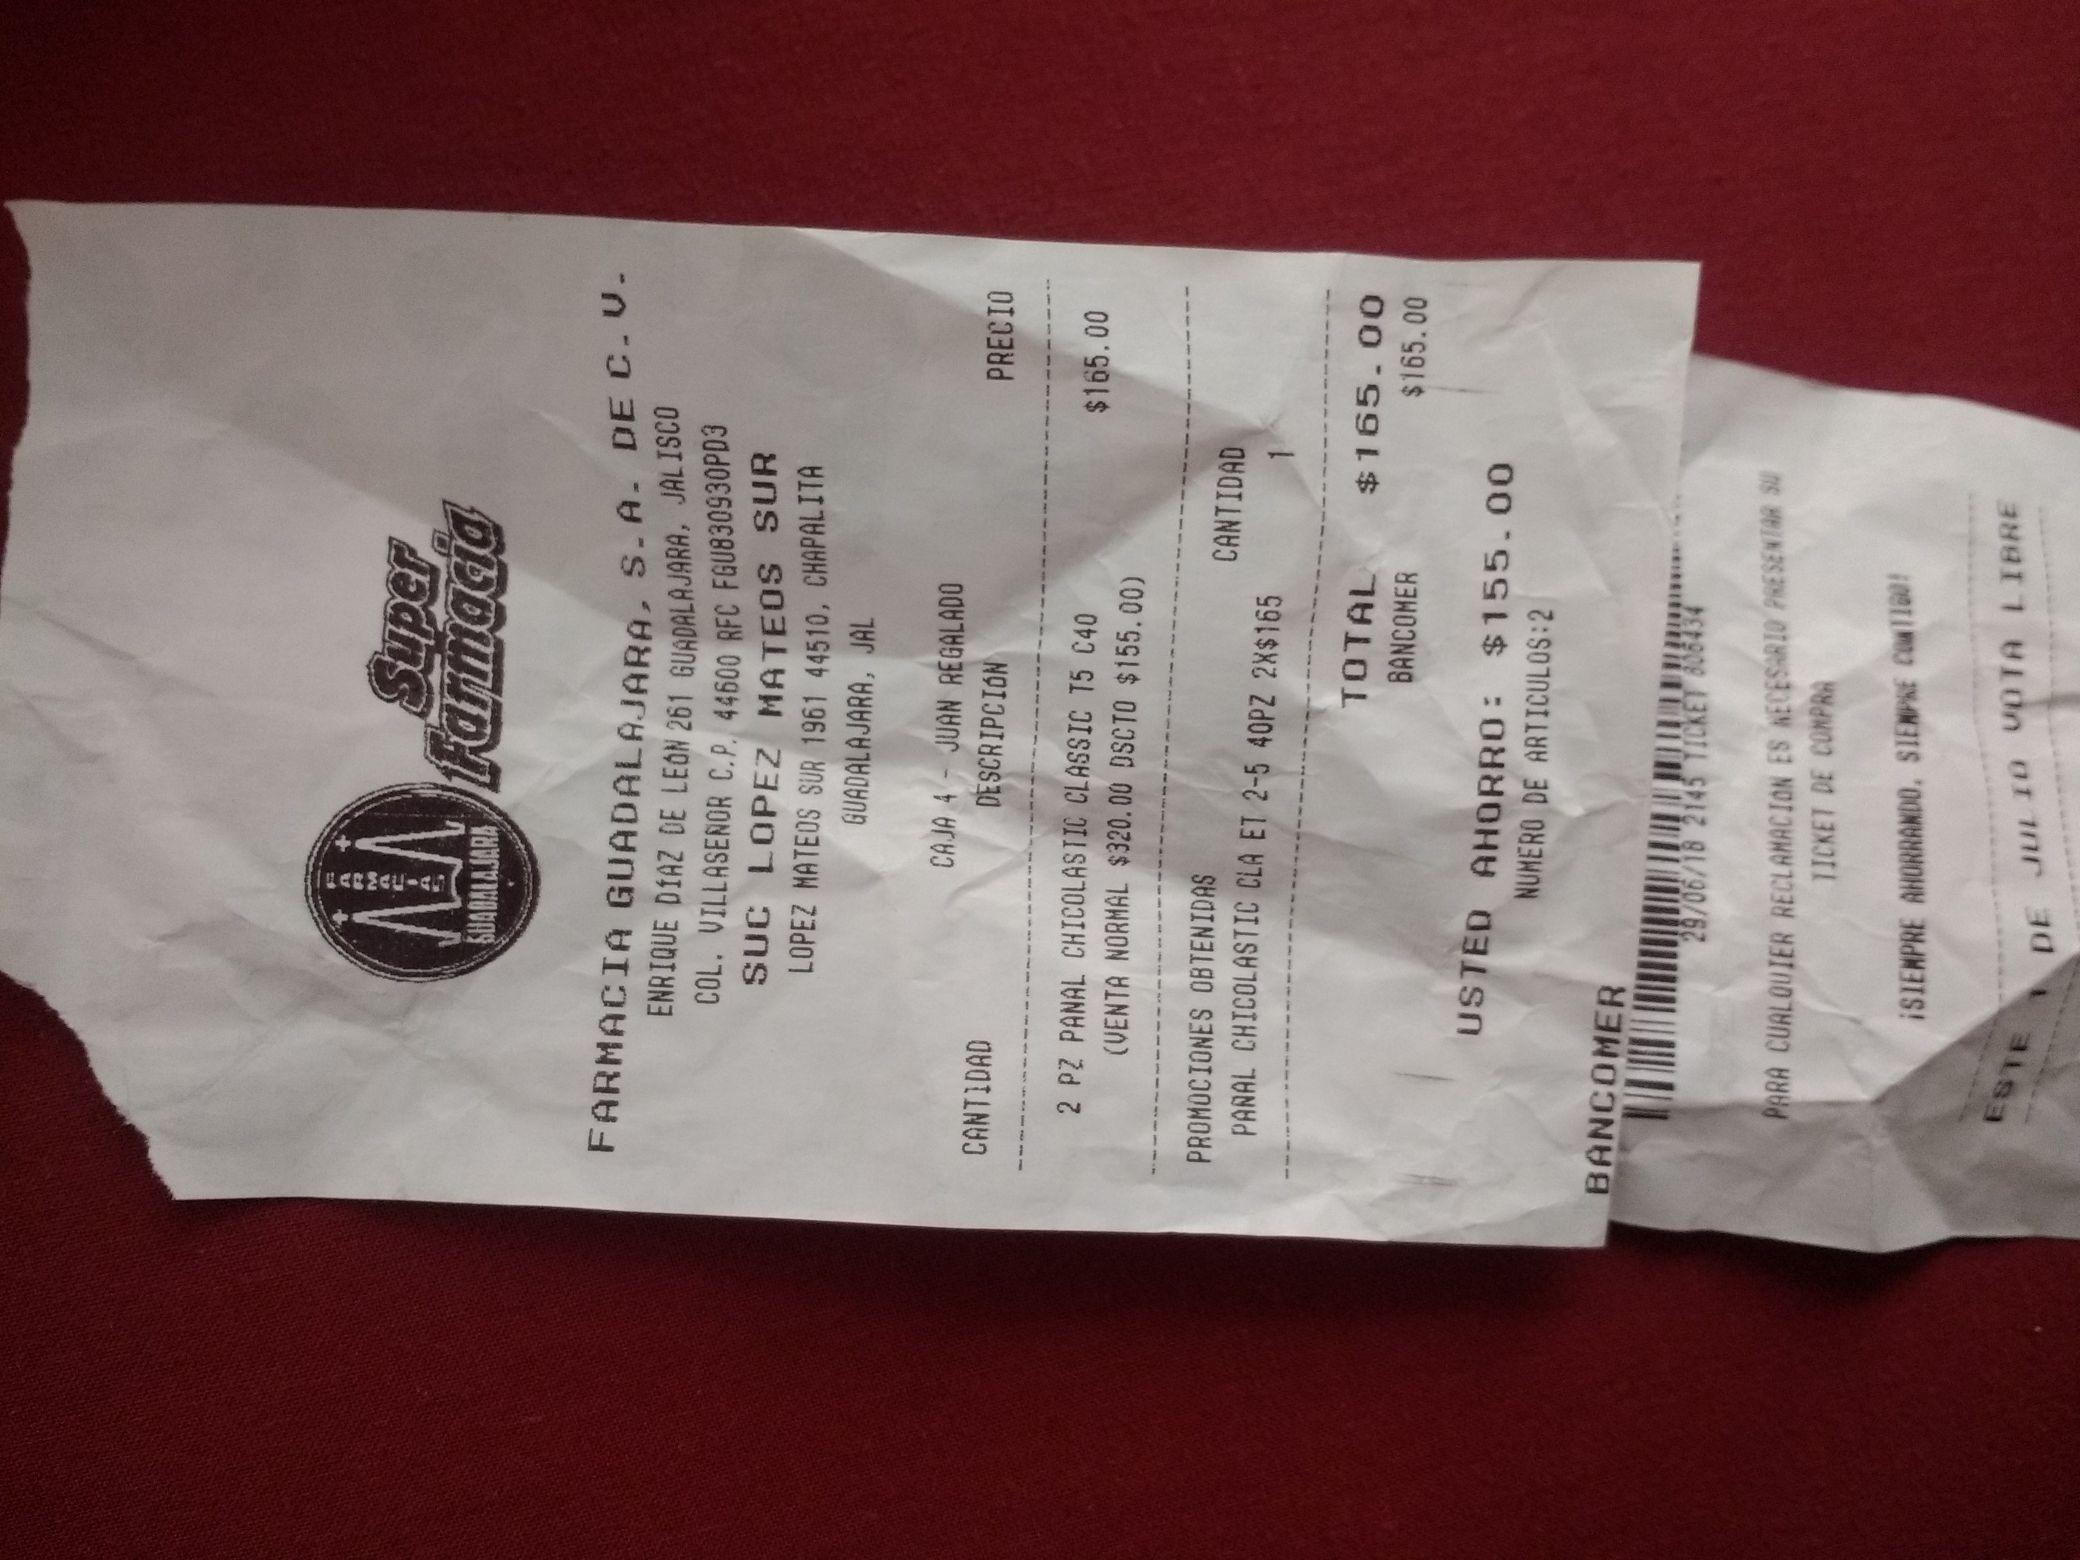 Farmacias Guadalajara: Pañales Chicolastic 40 pzas etapa 2-5 2x$165